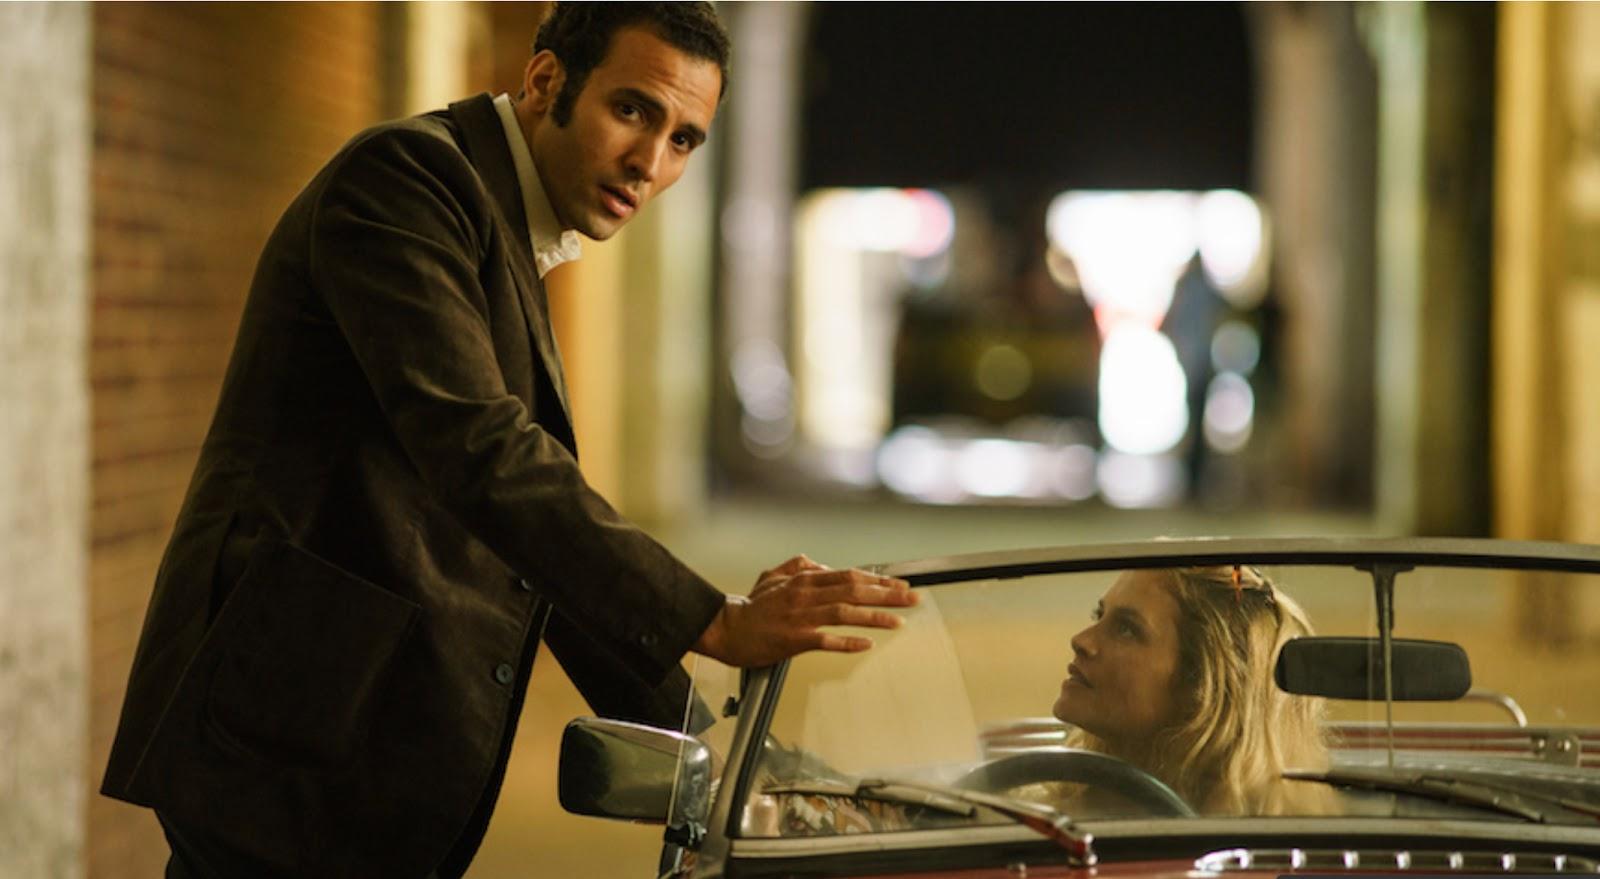 Marwan Kenzari stars in The Angel spy film